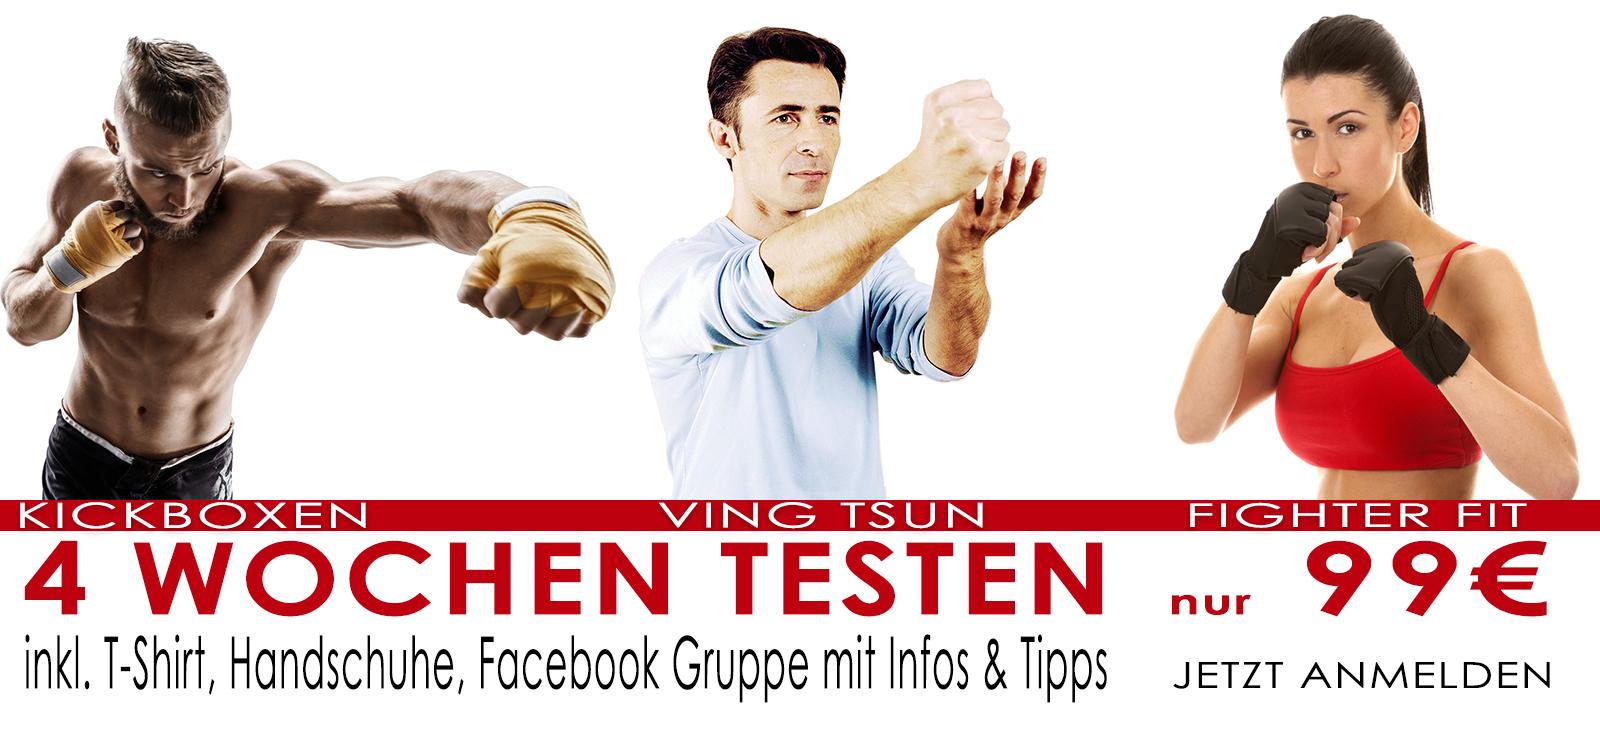 Kickboxen - Ving Tsun - Fighter Fit 4 Wochen Testen